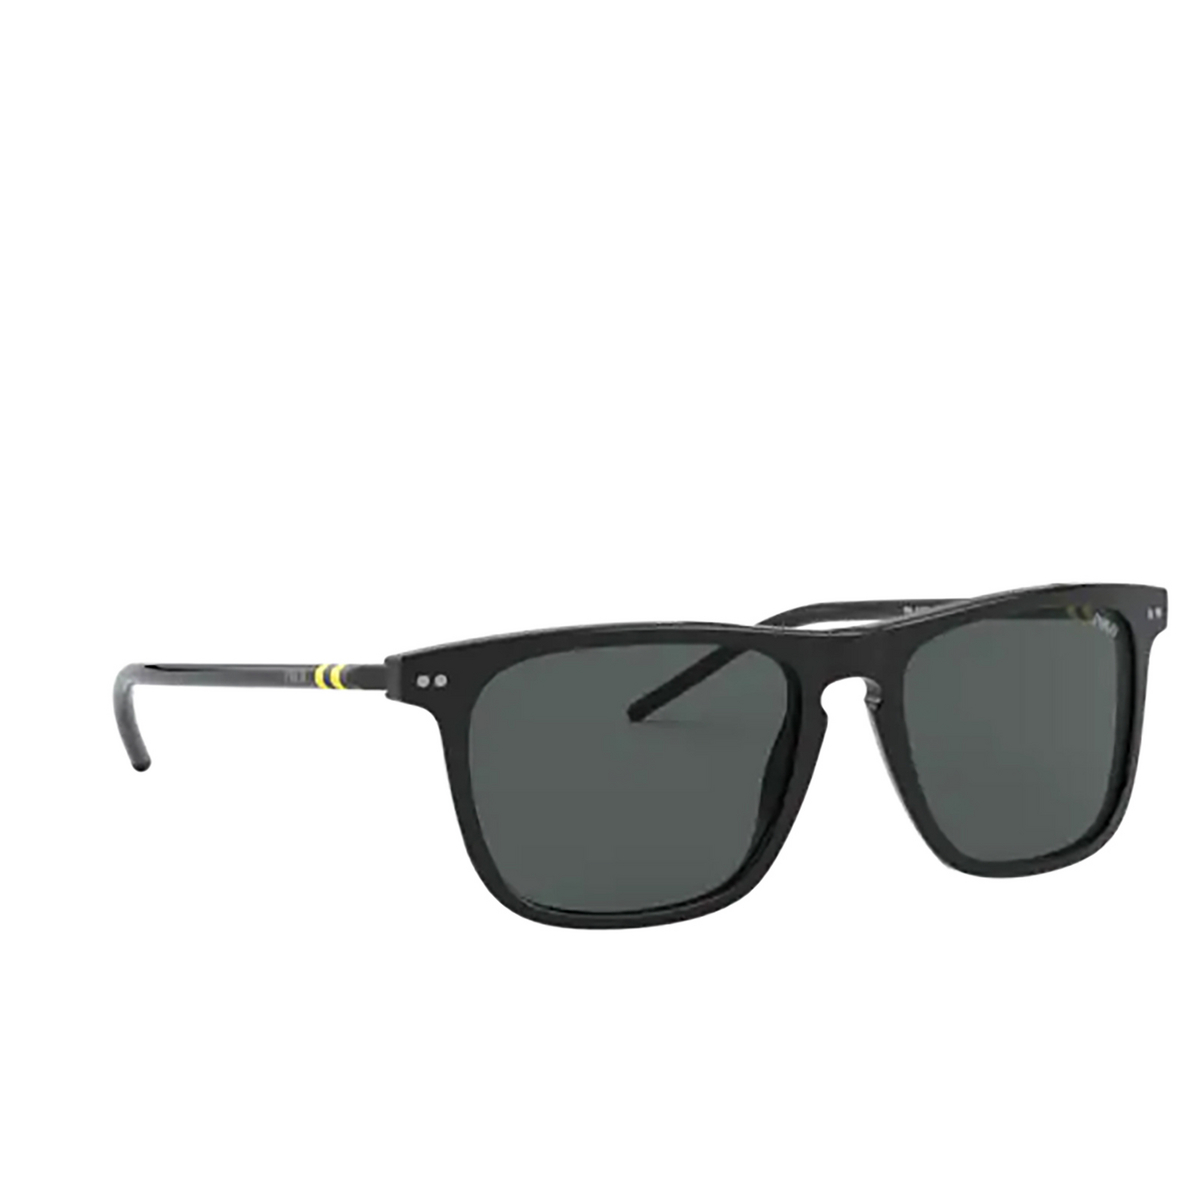 Polo Ralph Lauren® Square Sunglasses: PH4168 color Shiny Black 500187.